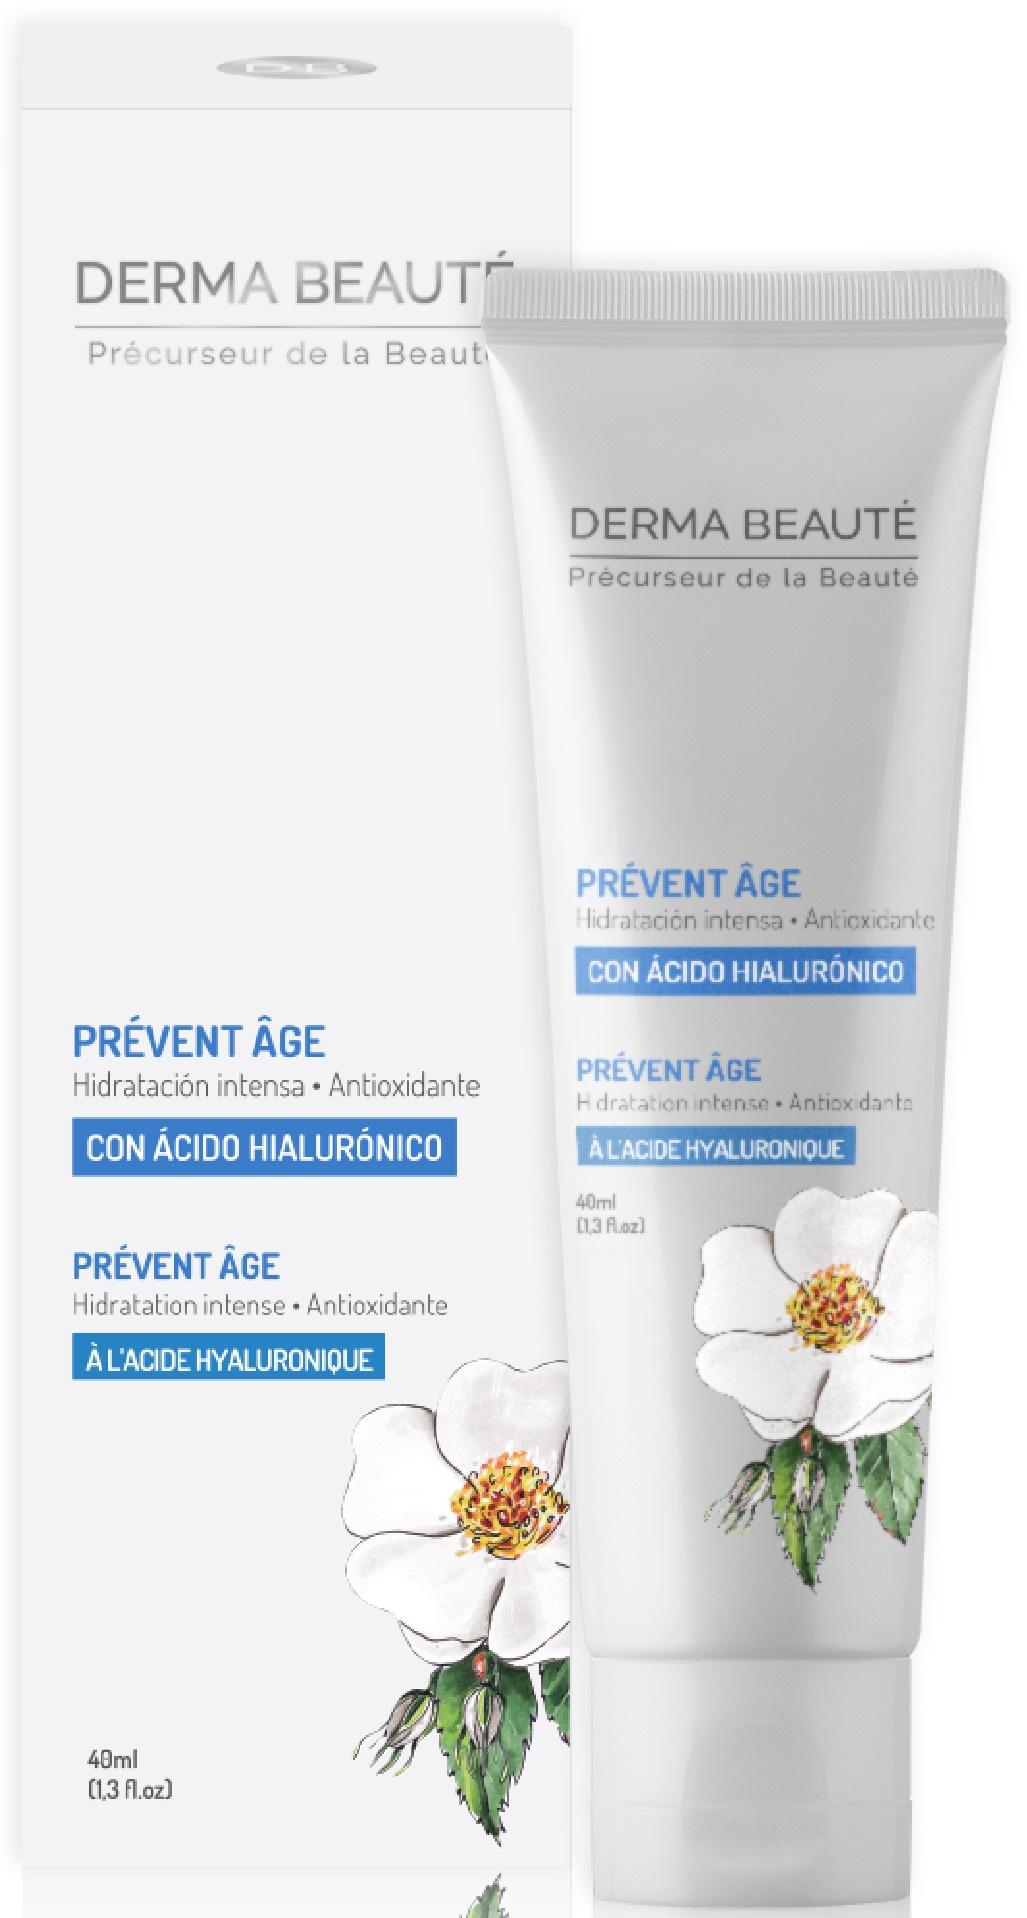 Derma Beauté Prevent Age Hyaluronic Acid Cream